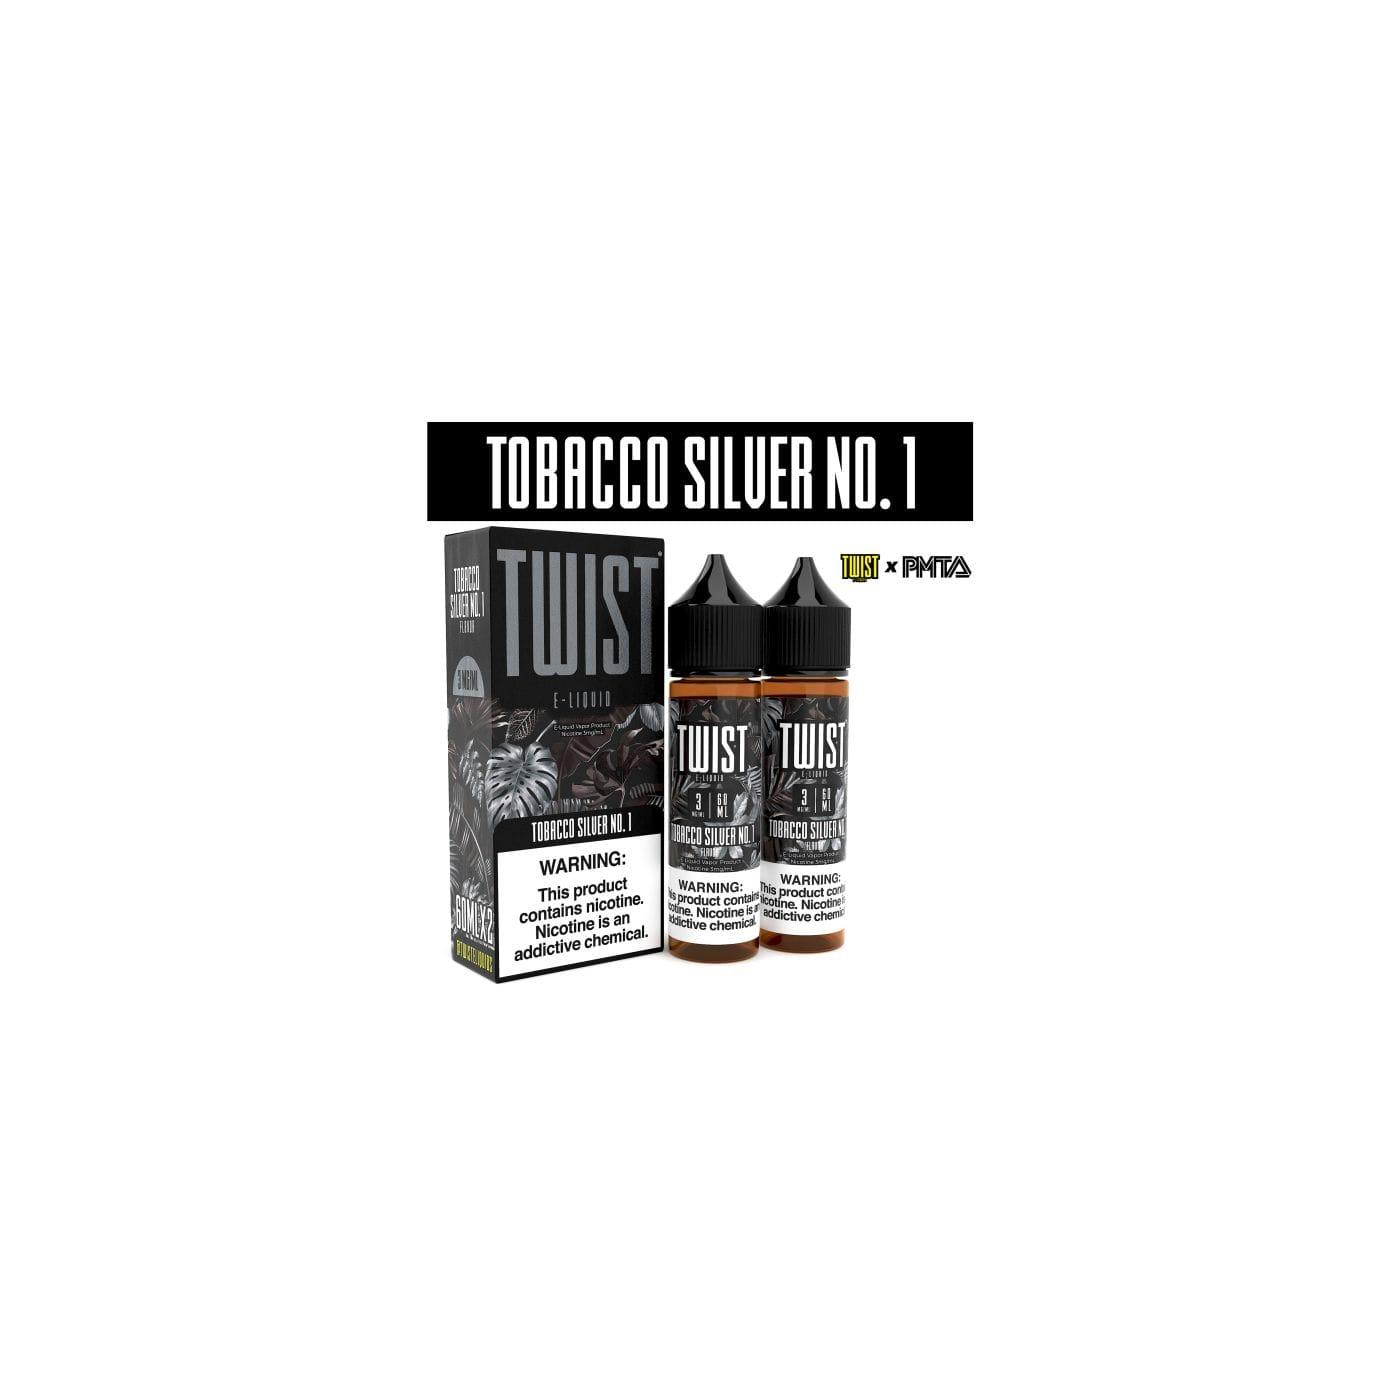 Twist Tobacco Silver No. 1 - 2 Pack